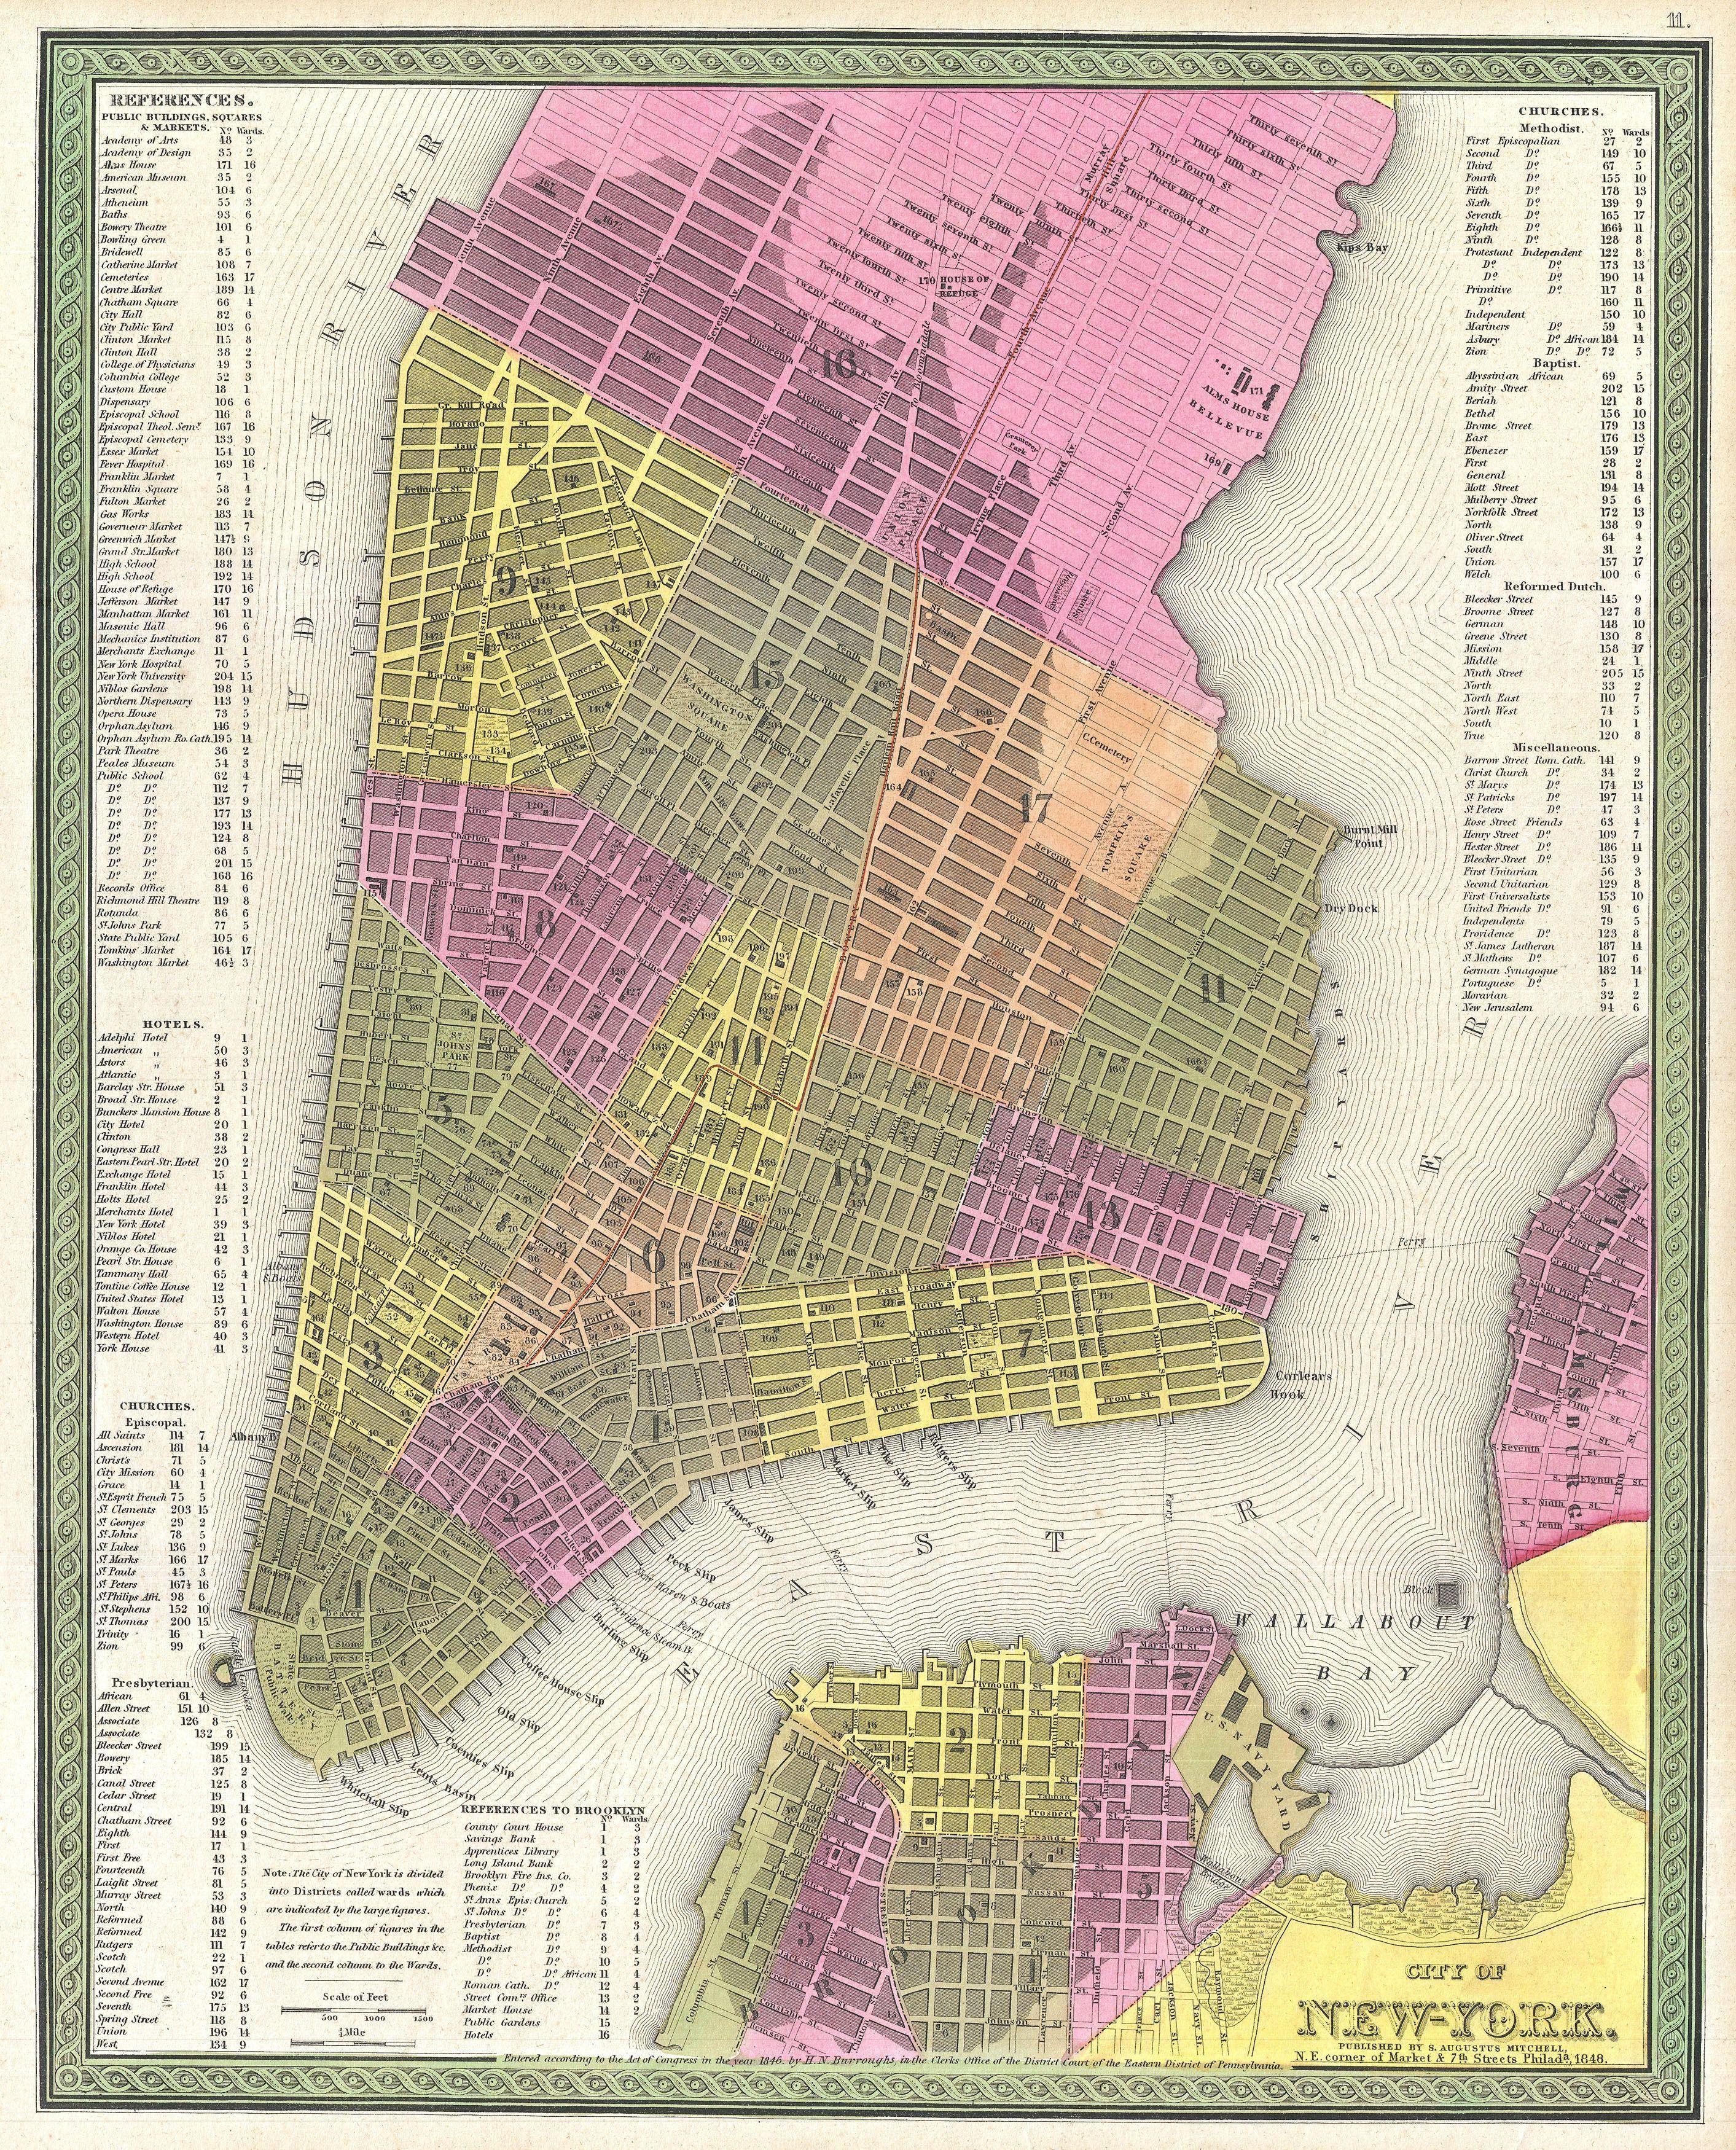 Gorgeous 1848 map of New York City Interesting history stuff